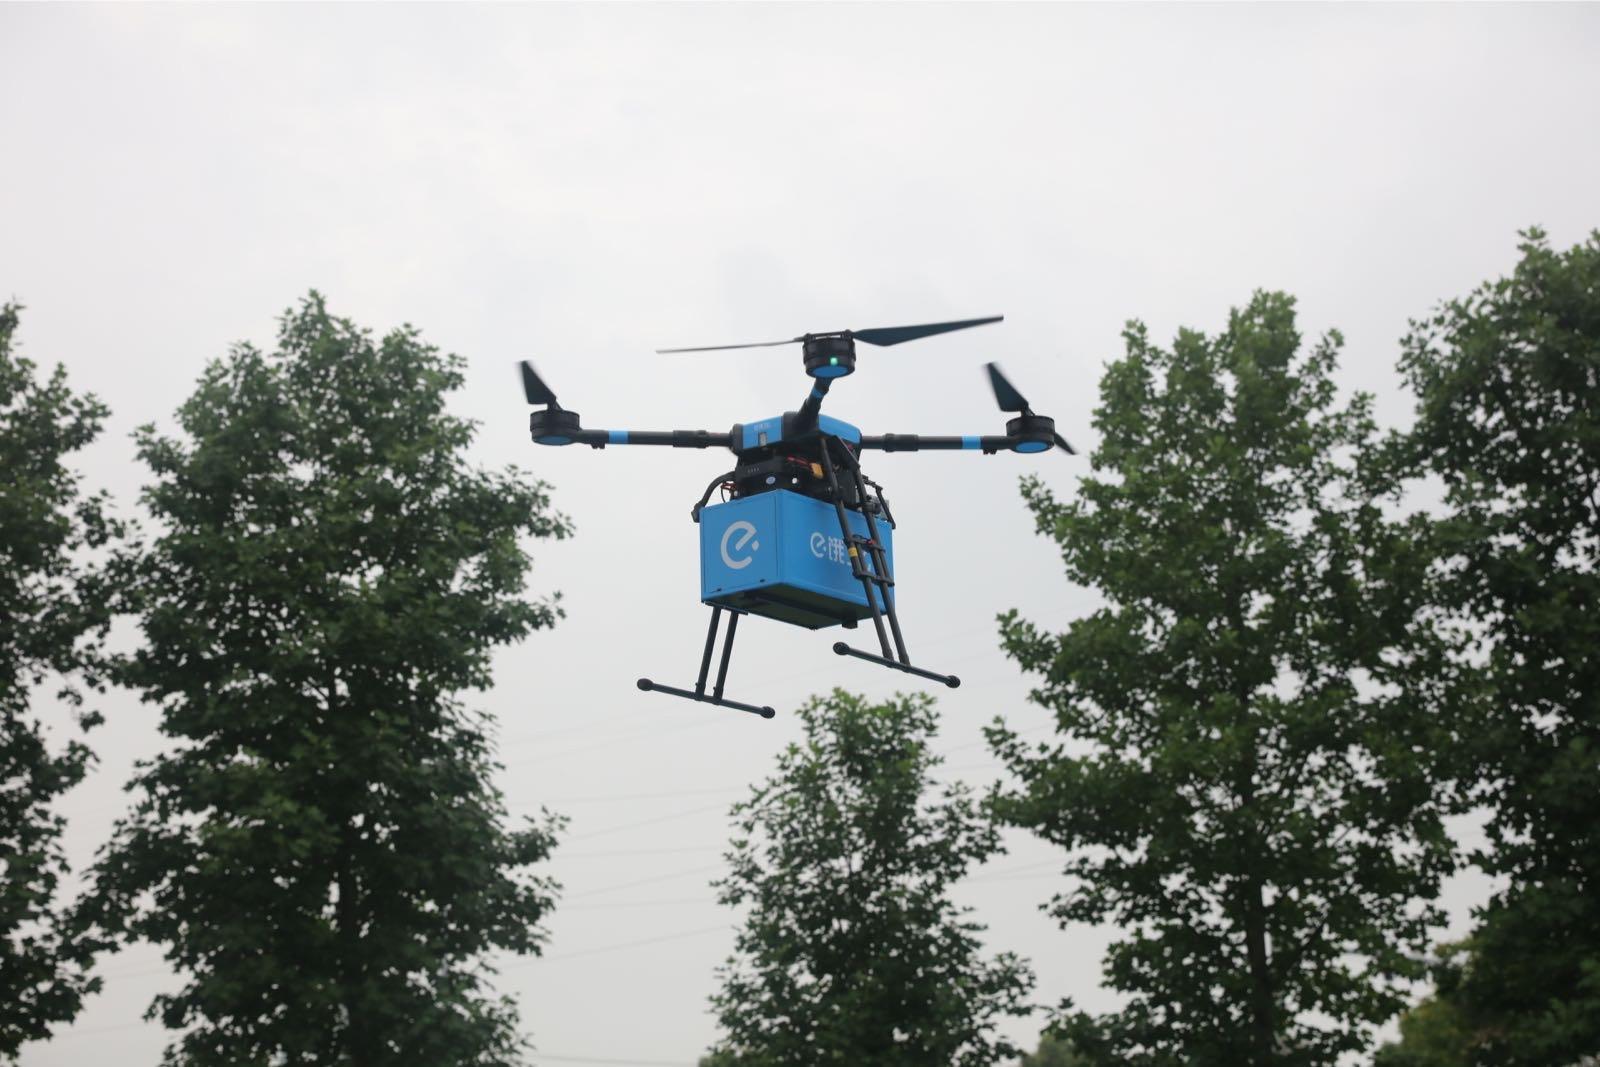 201805/food-delivery-drones-shanghai-2.jpg